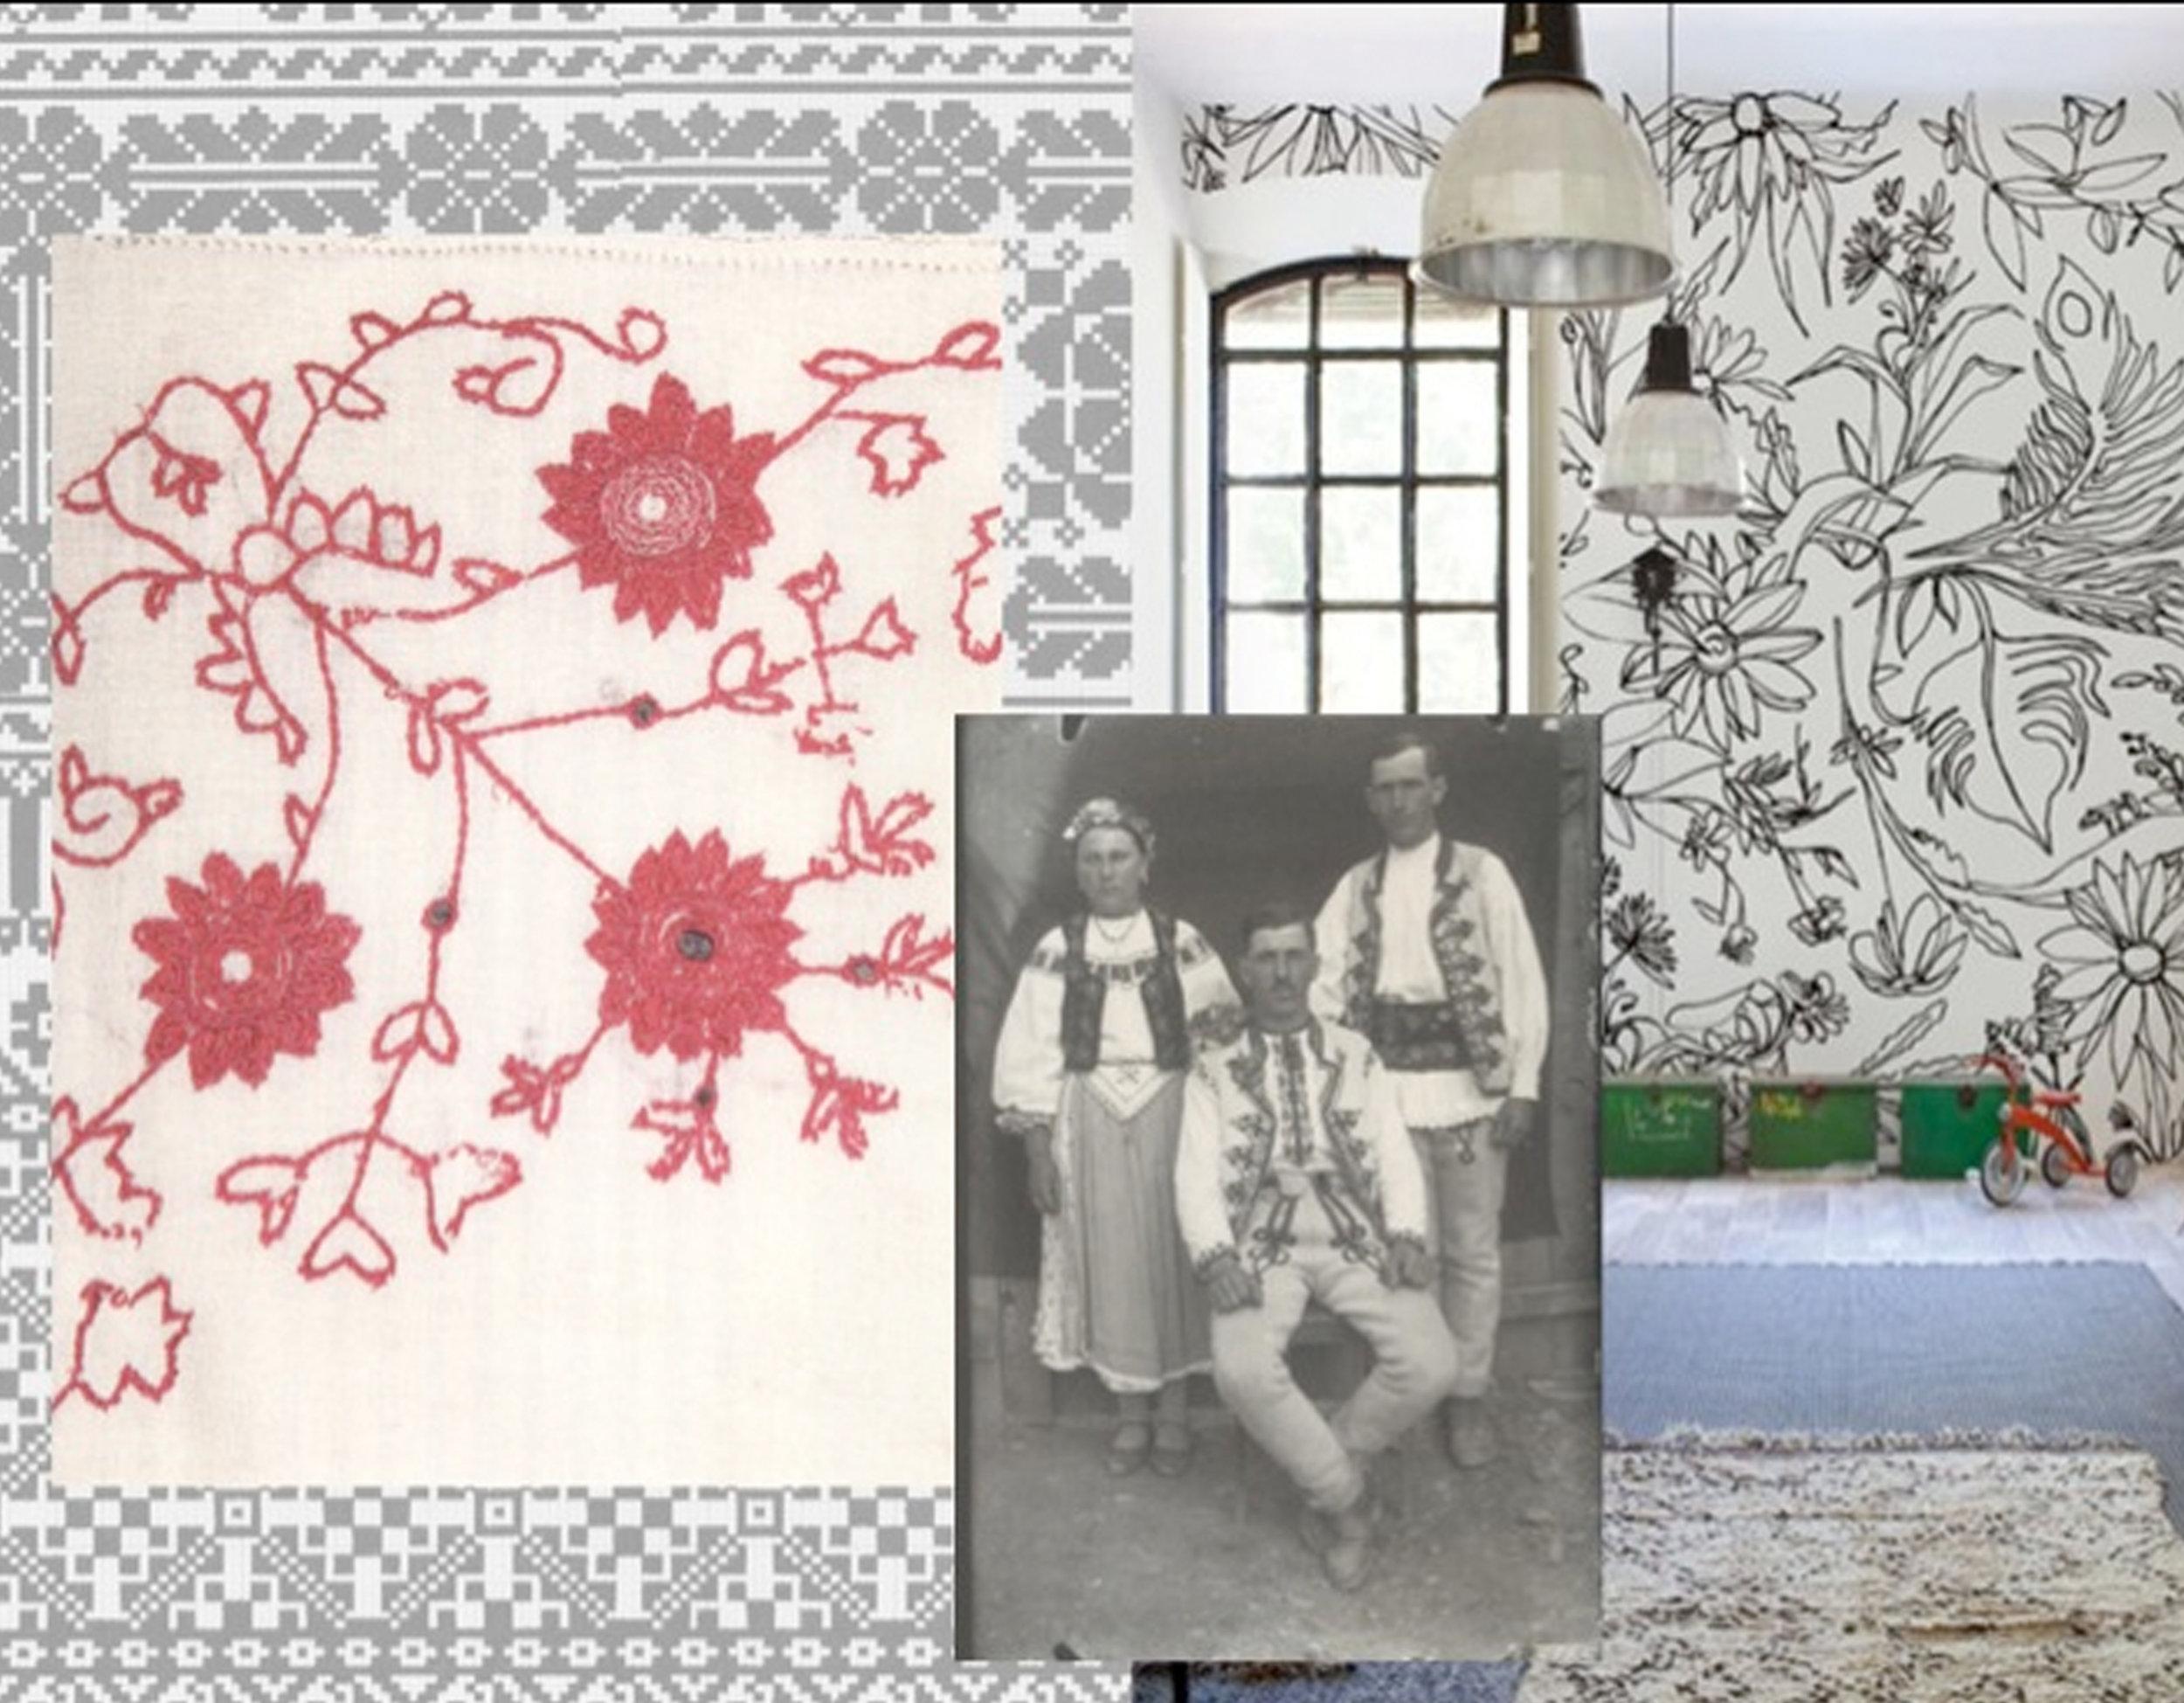 traditional embroidery  Muzeul Taranului Roman as inspiration for mural